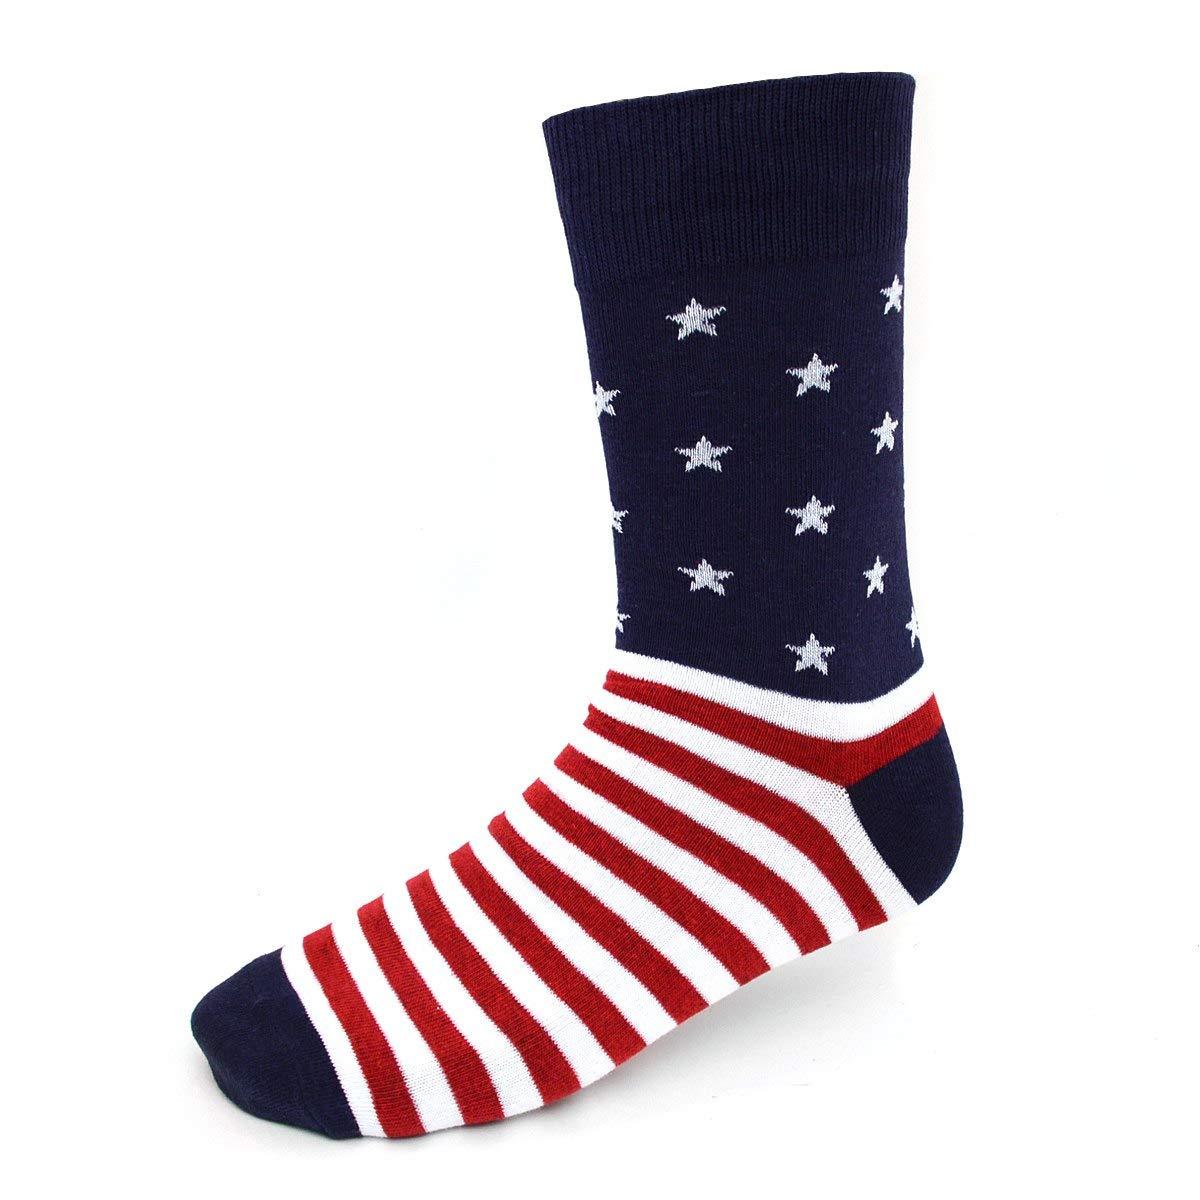 Stars and Stripes Novelty Dress Socks for Men Premium Cotton